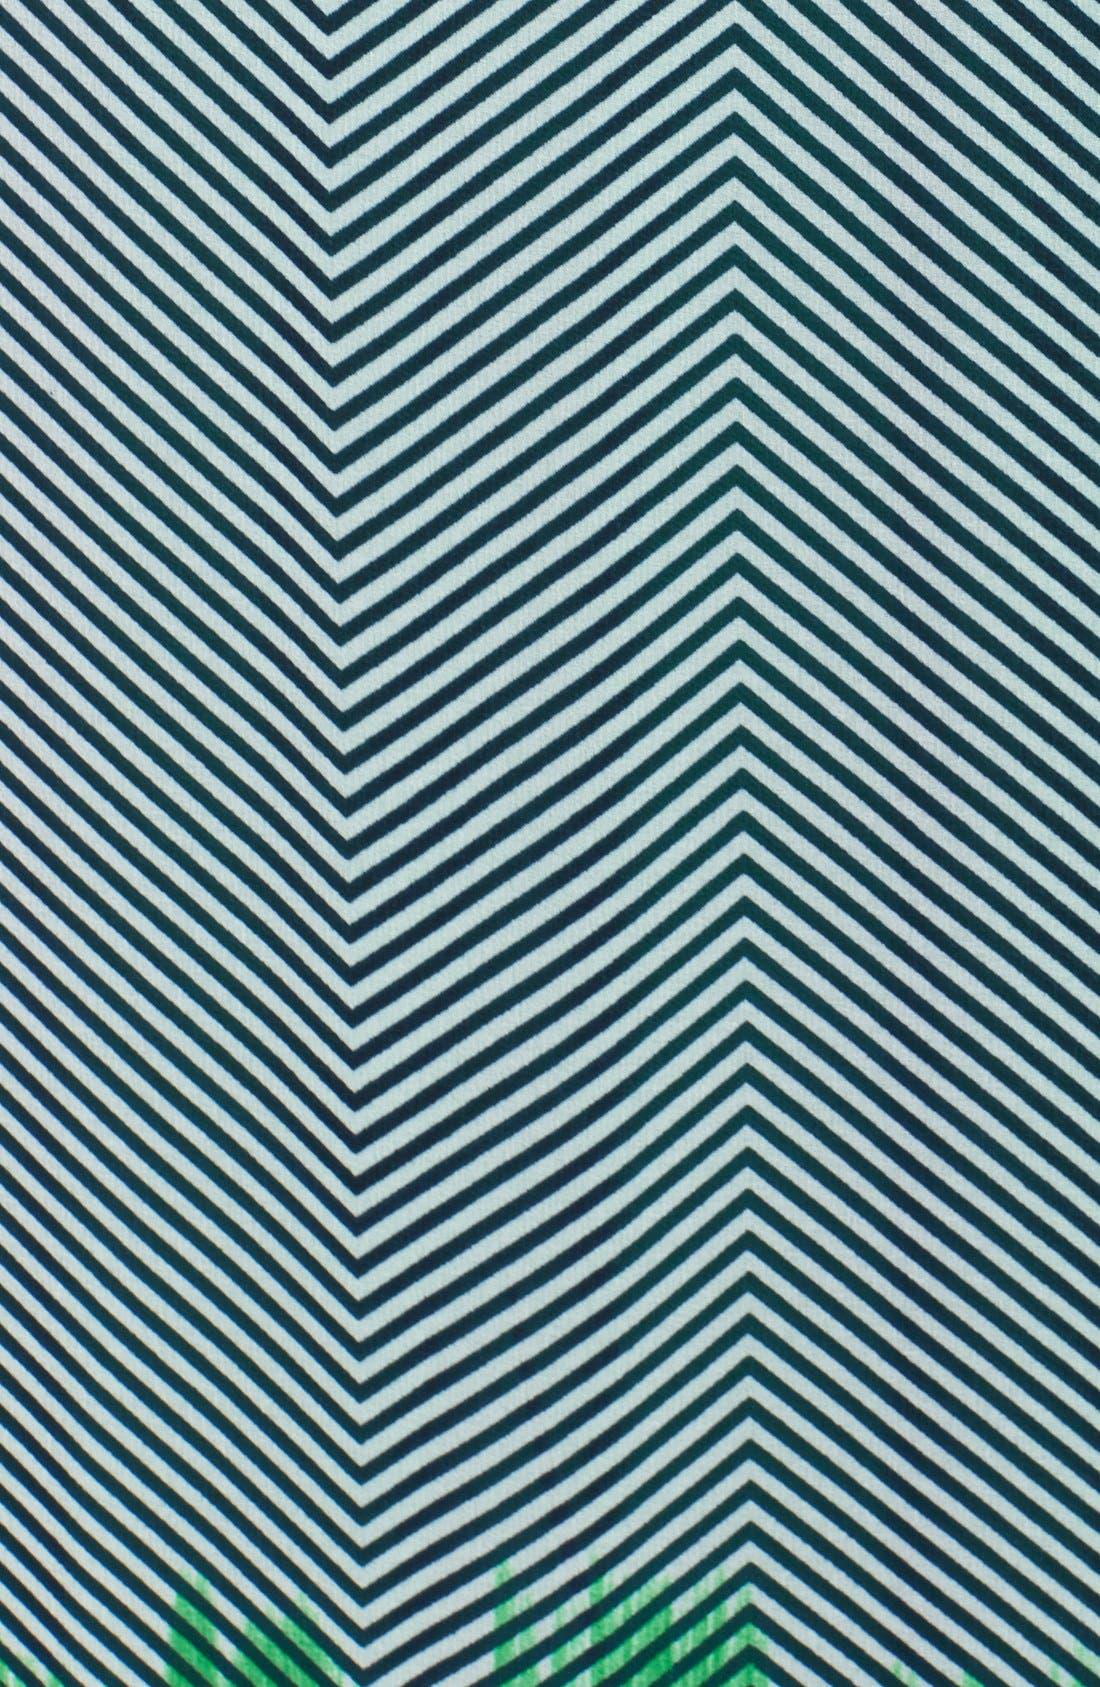 Alternate Image 3  - Vince Camuto Print Crepe Maxi Dress